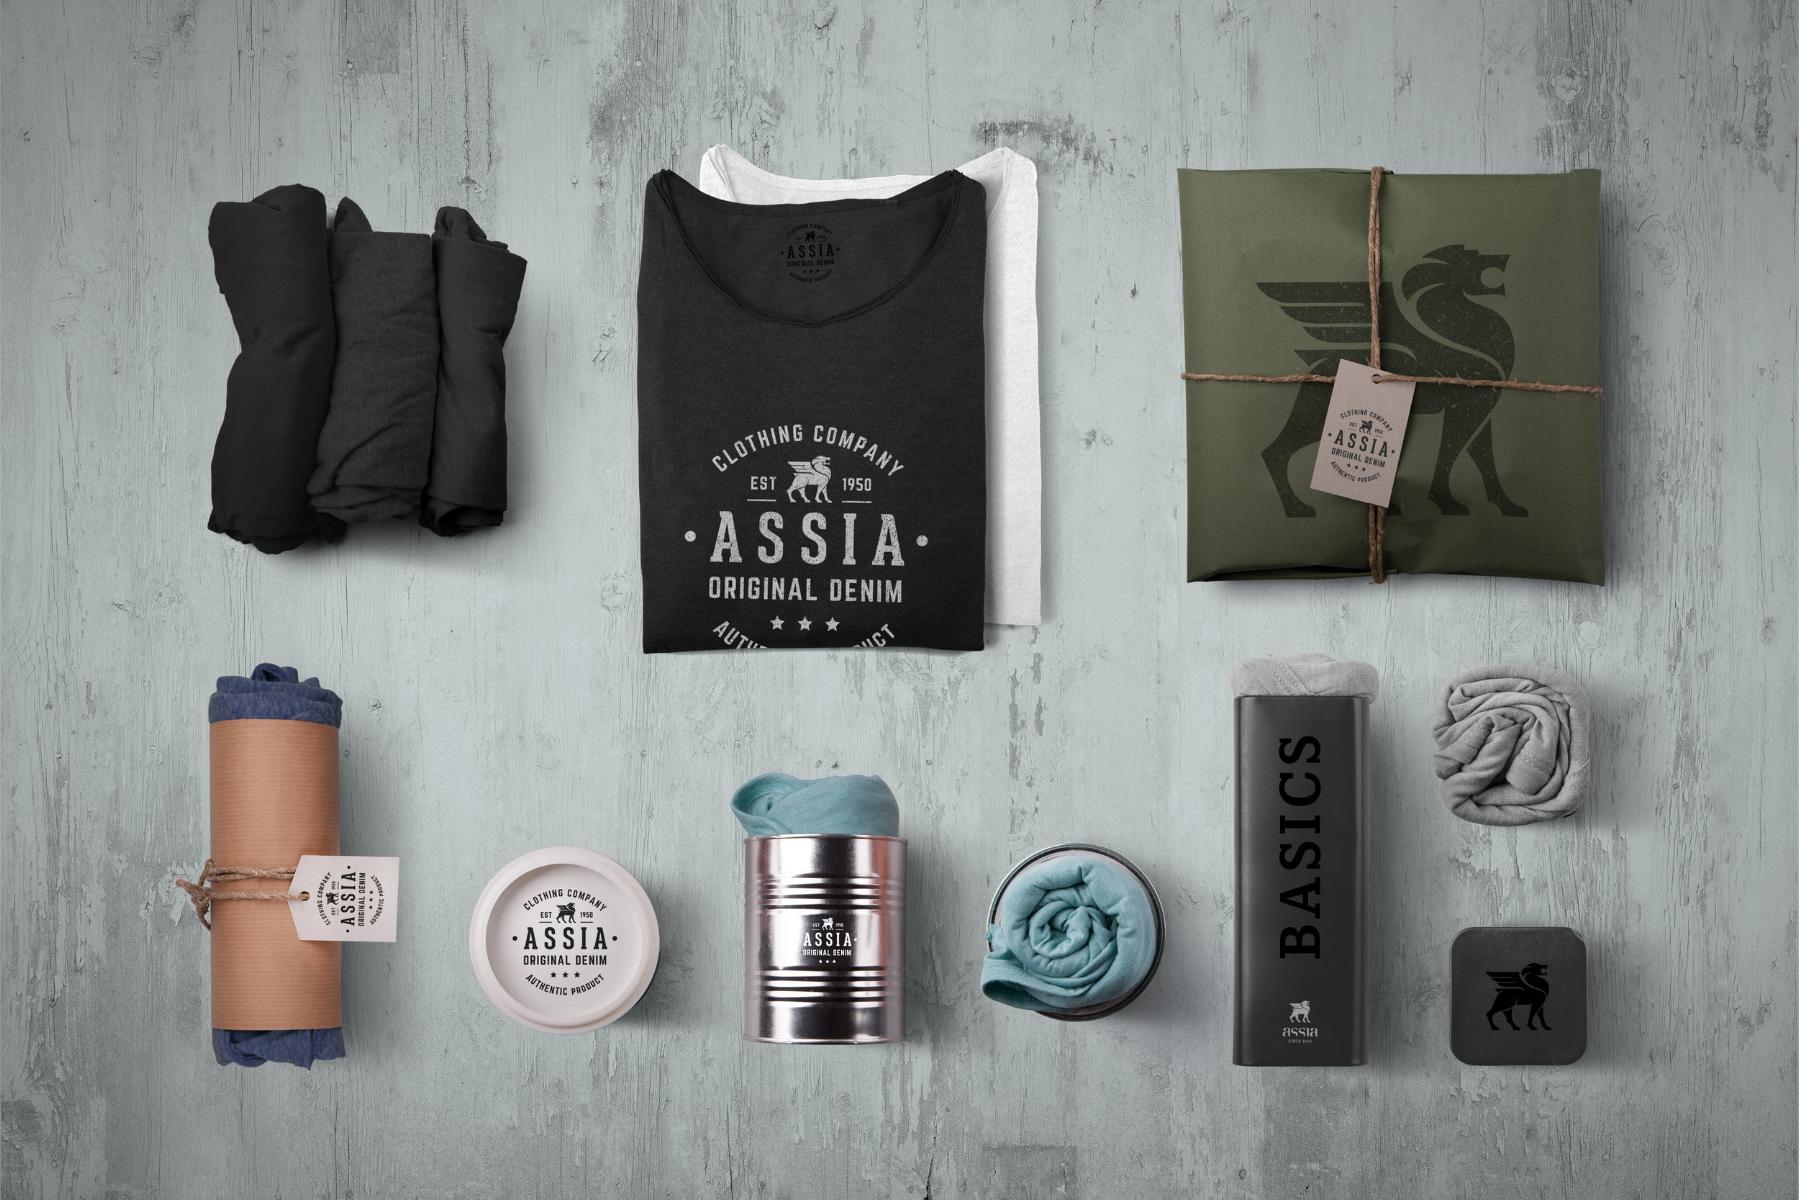 Assia Original Denim & Assia Basics packaging